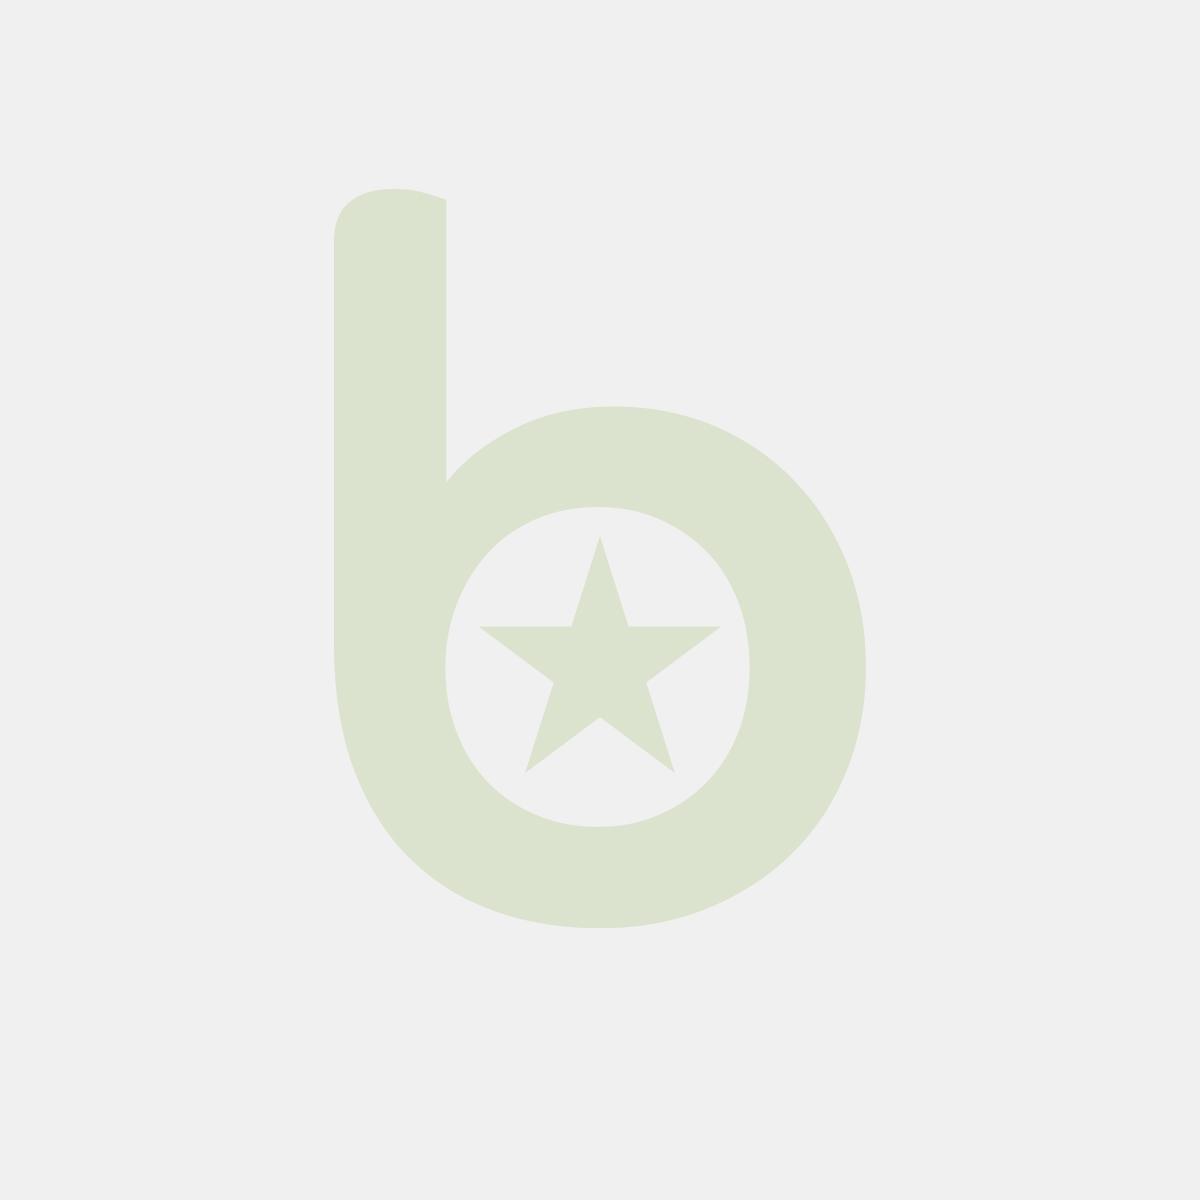 Etykieta 57x41, 800 etykiet TnK do MEDESA, Basic Label